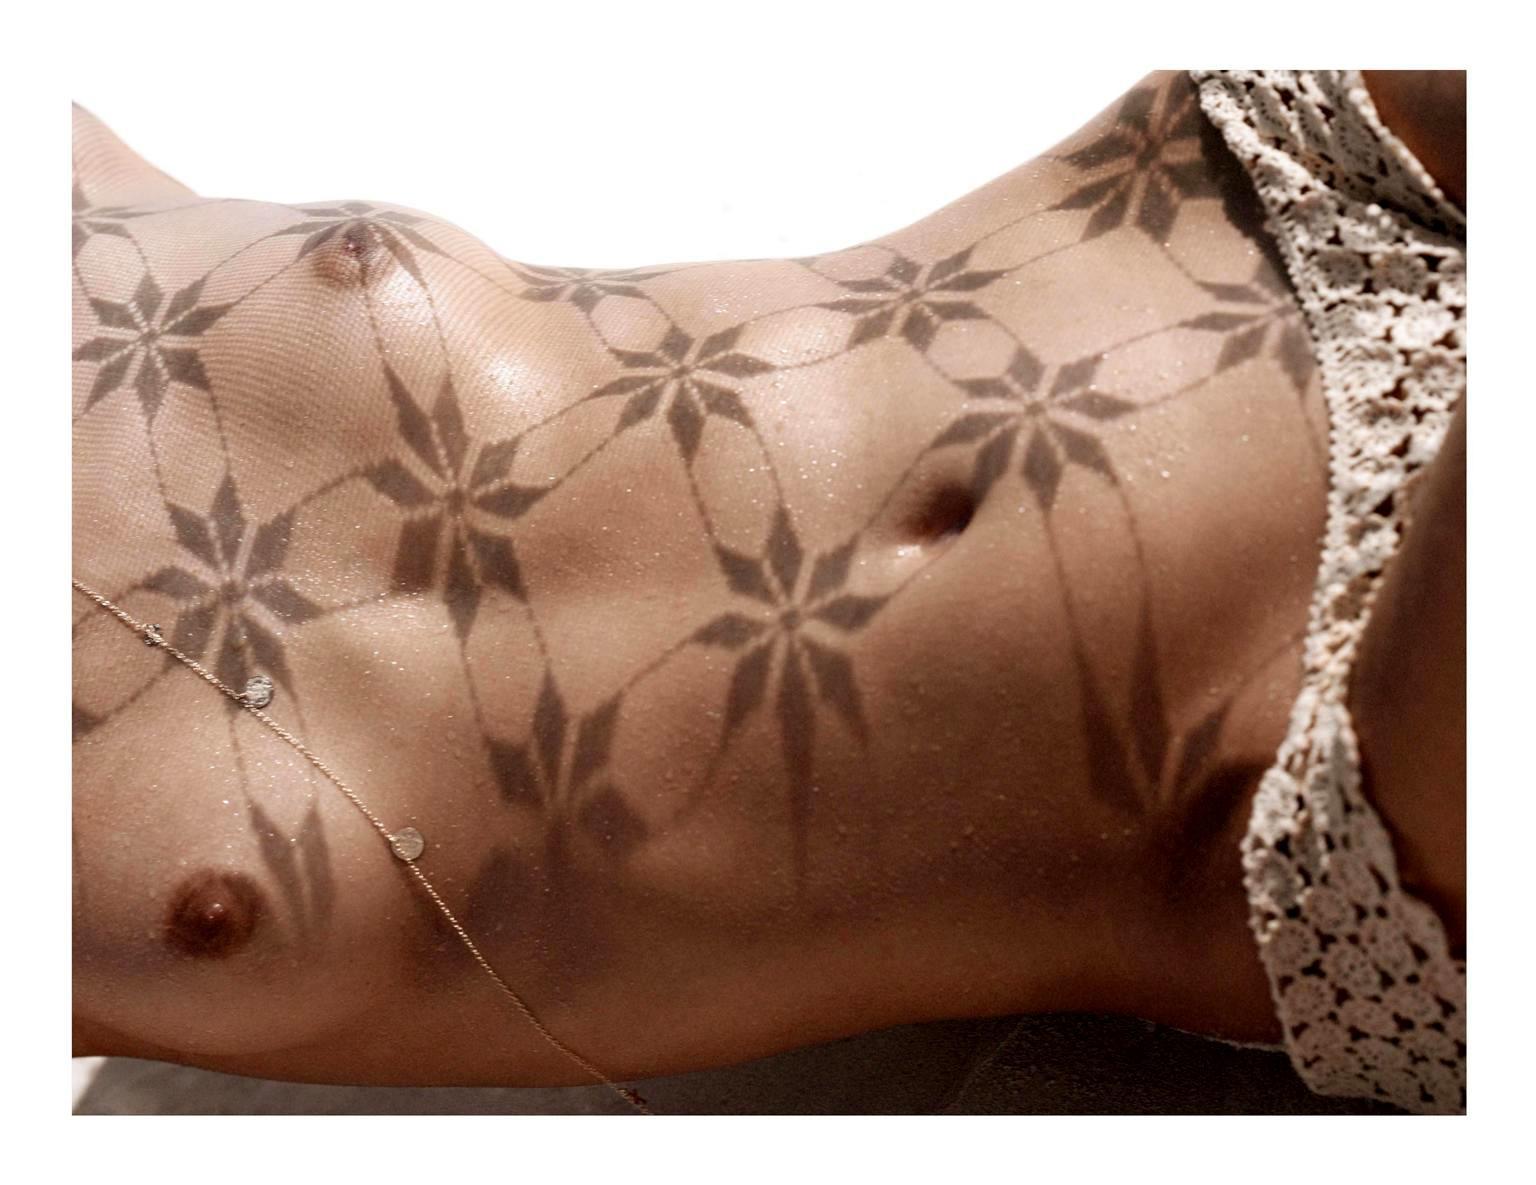 Rianne_Ten_Haken-Enrique_Badulescu-Vogue_Germany-02.jpeg